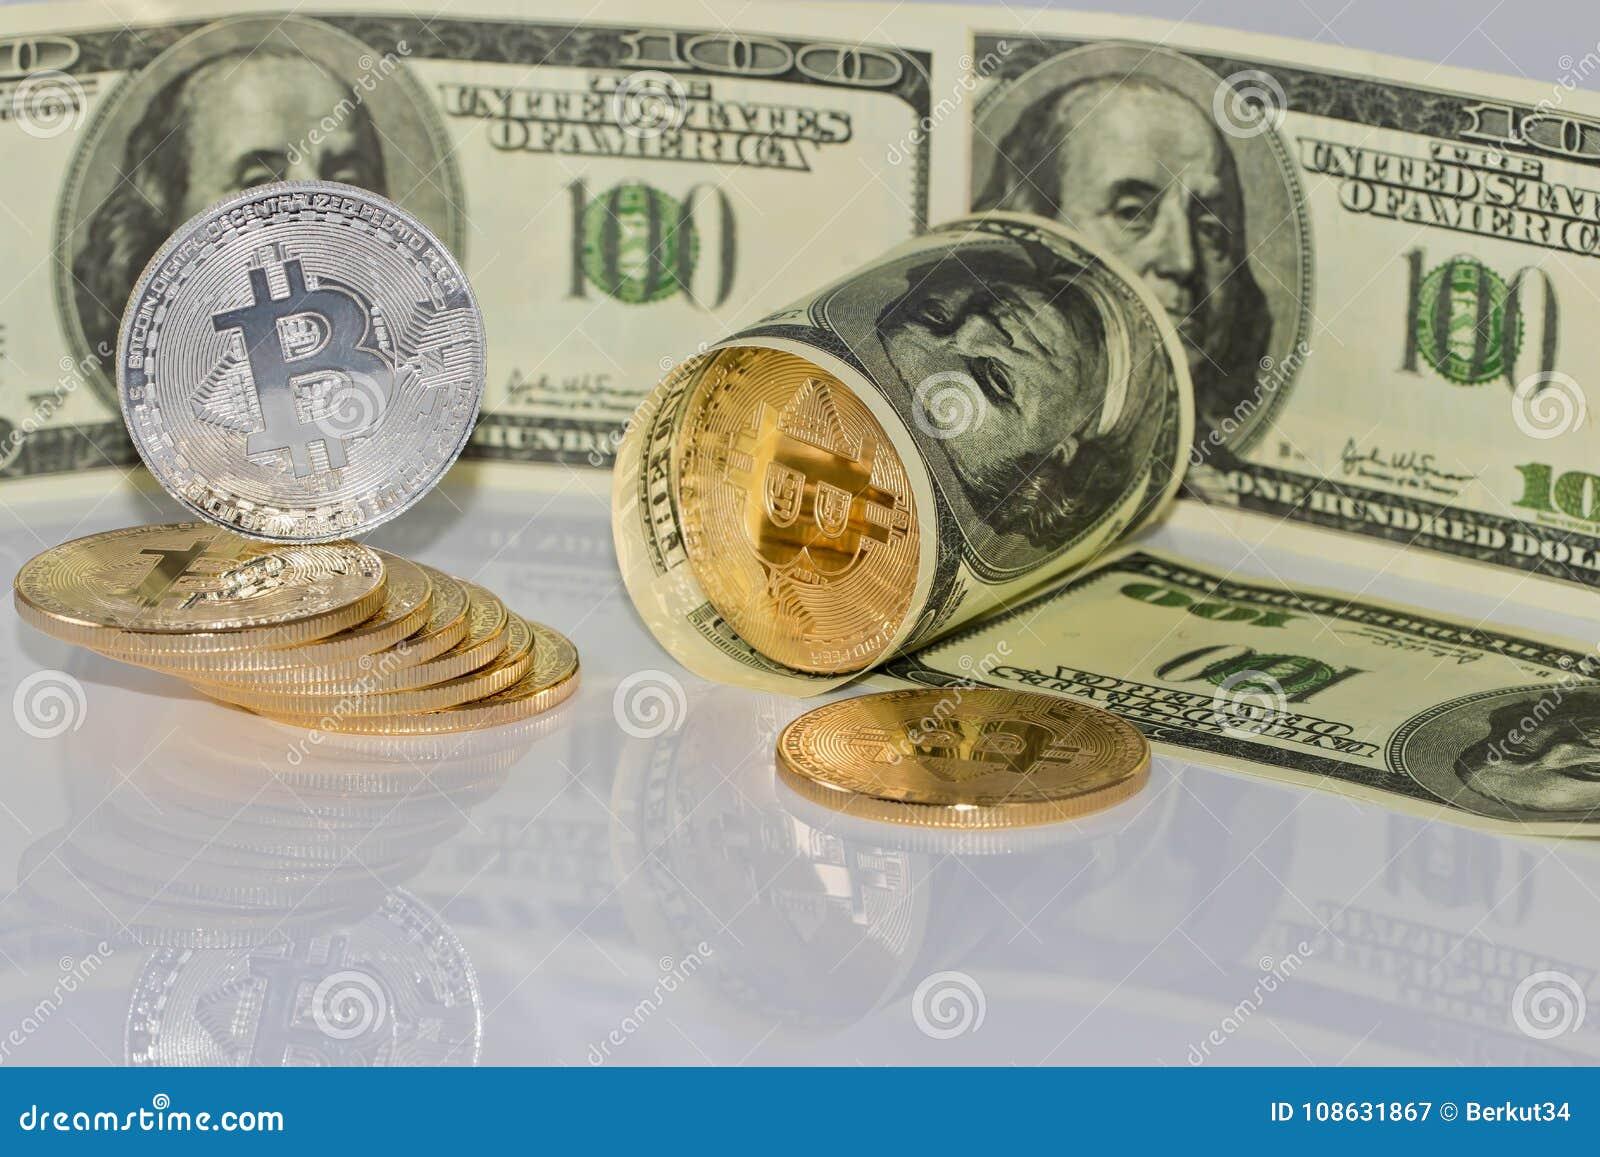 Turning money into bitcoins binary options free training